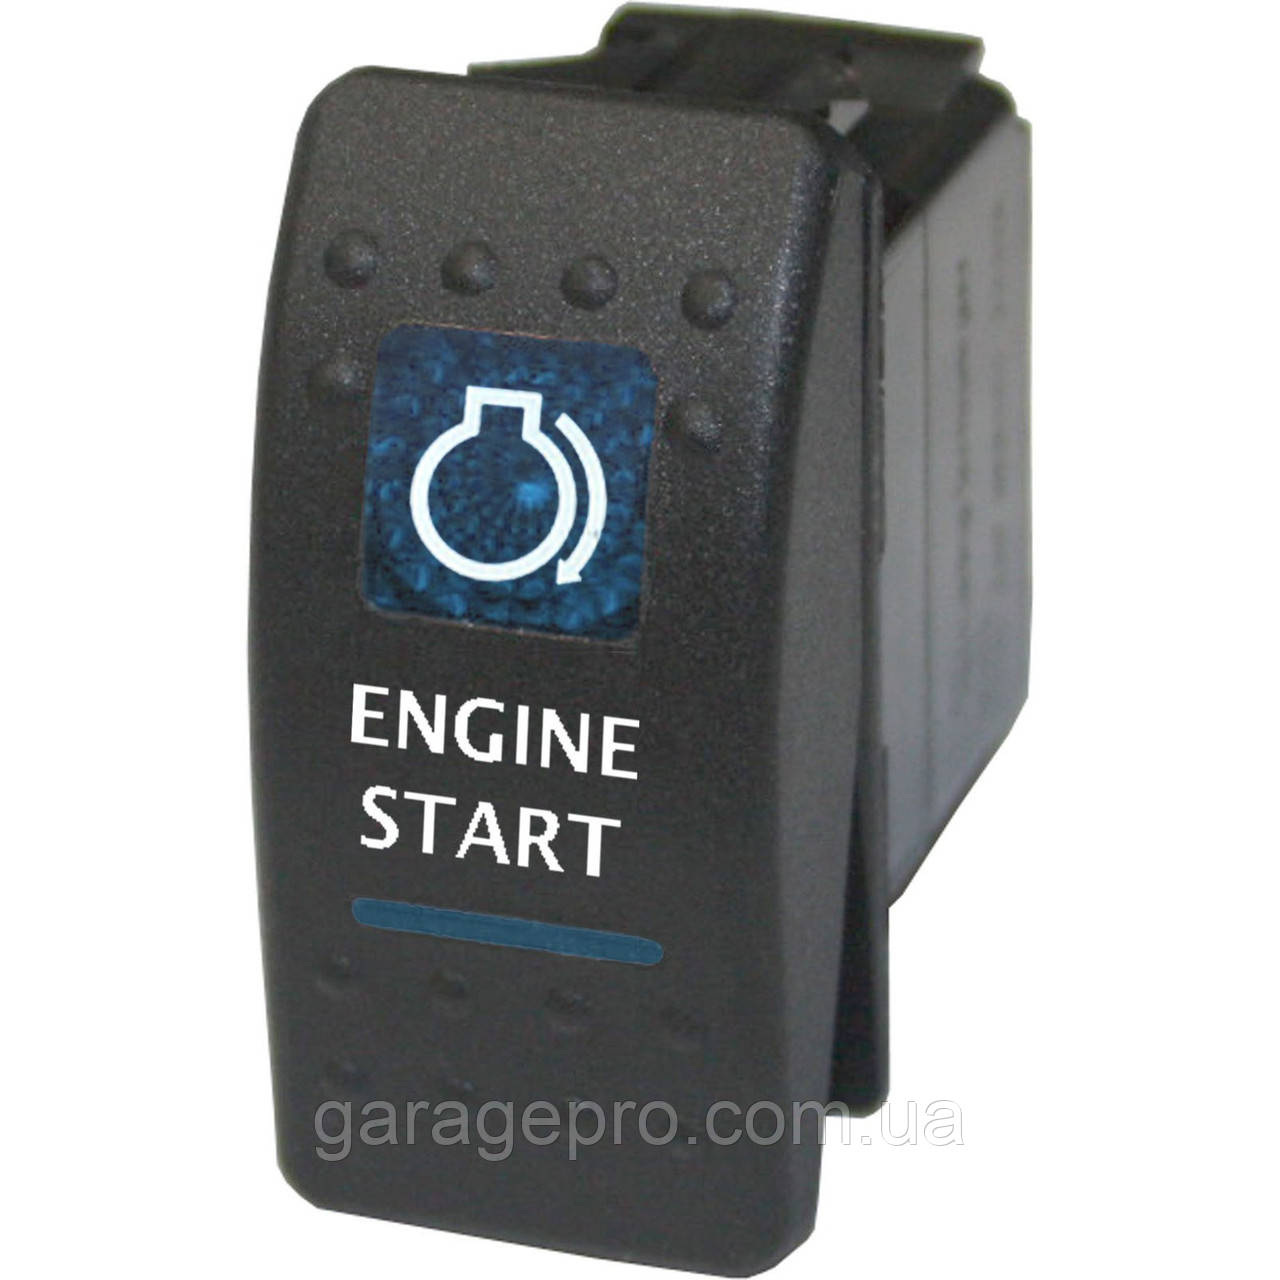 Тумблер для запуска двигателя Engine Start (тип A)